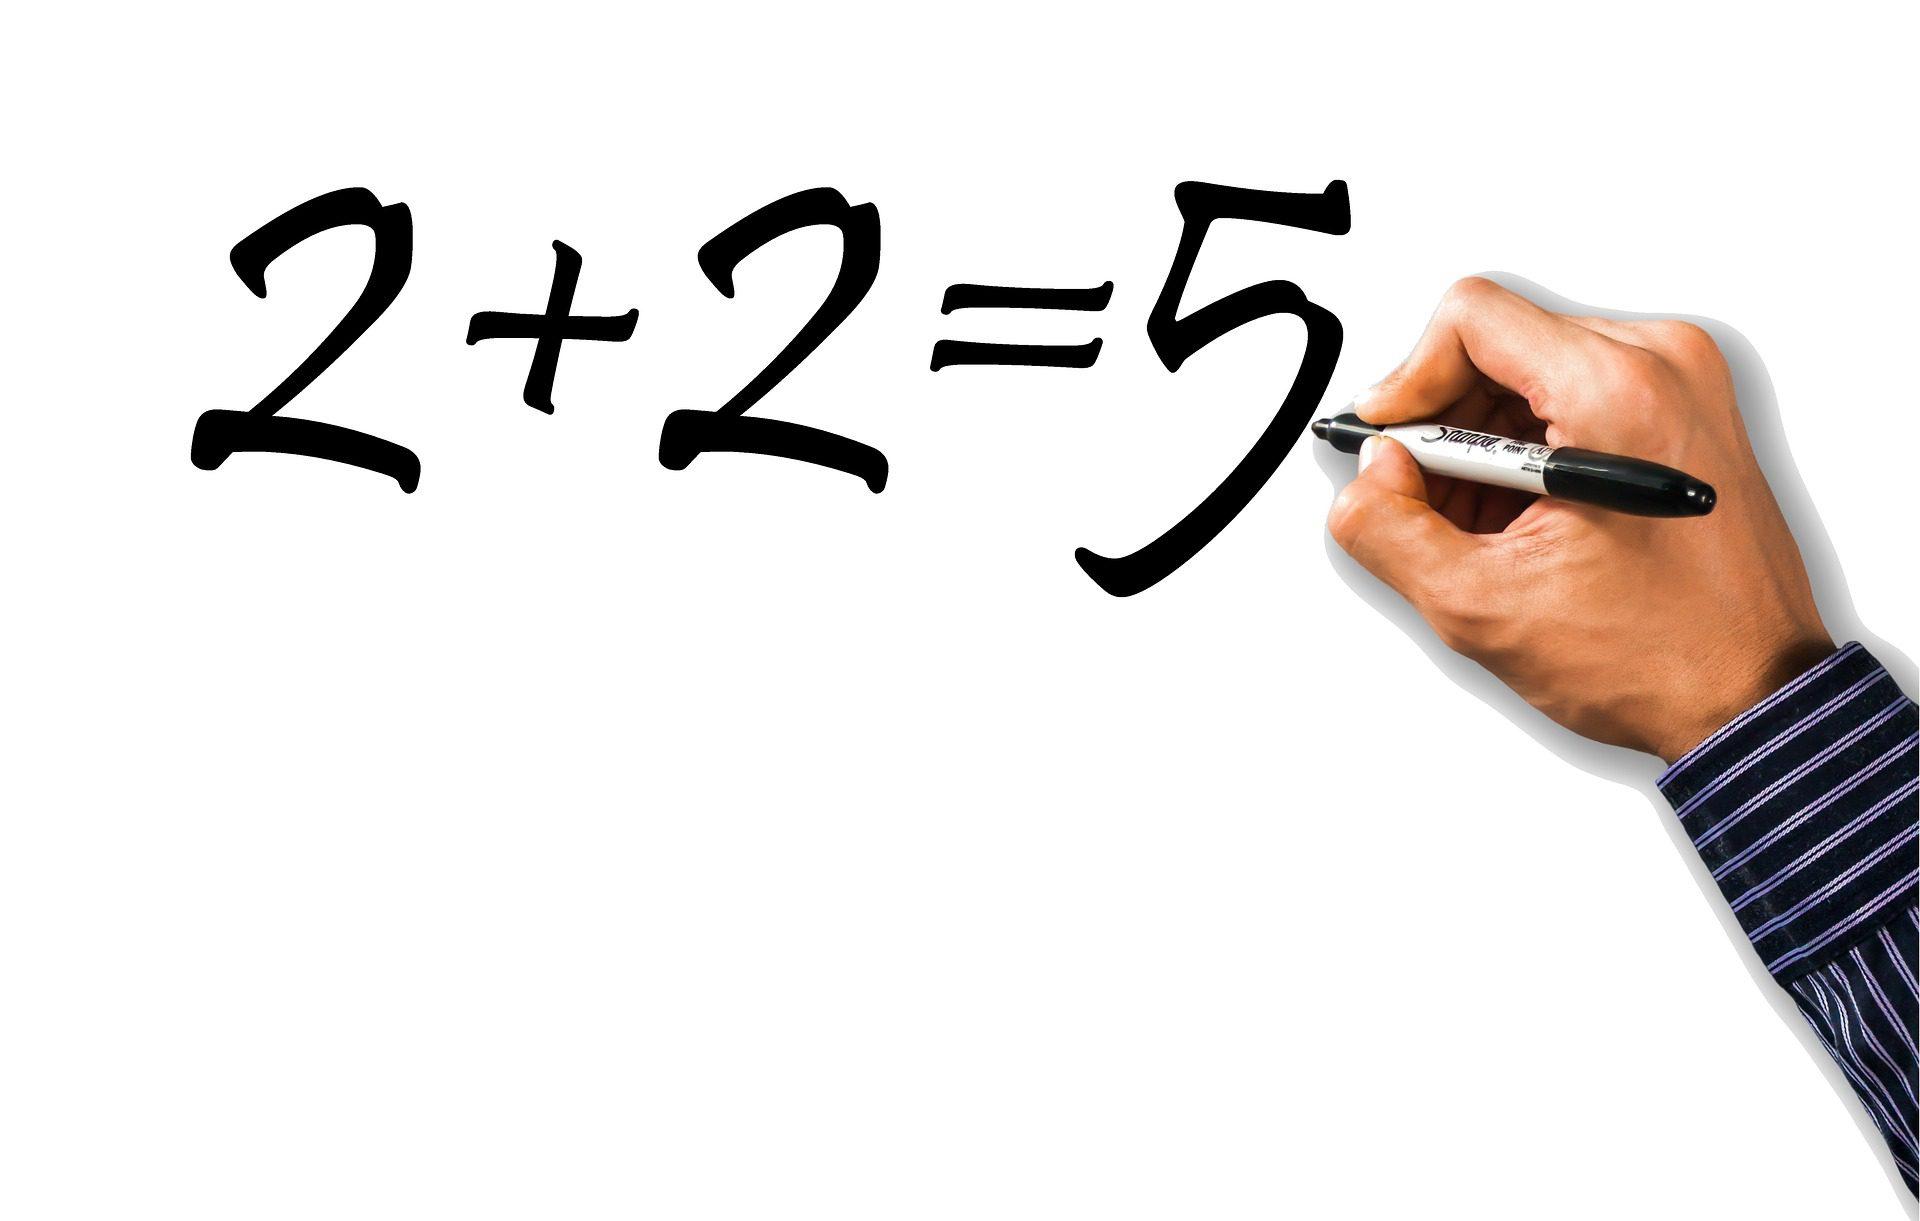 Equations. (Pixabay)